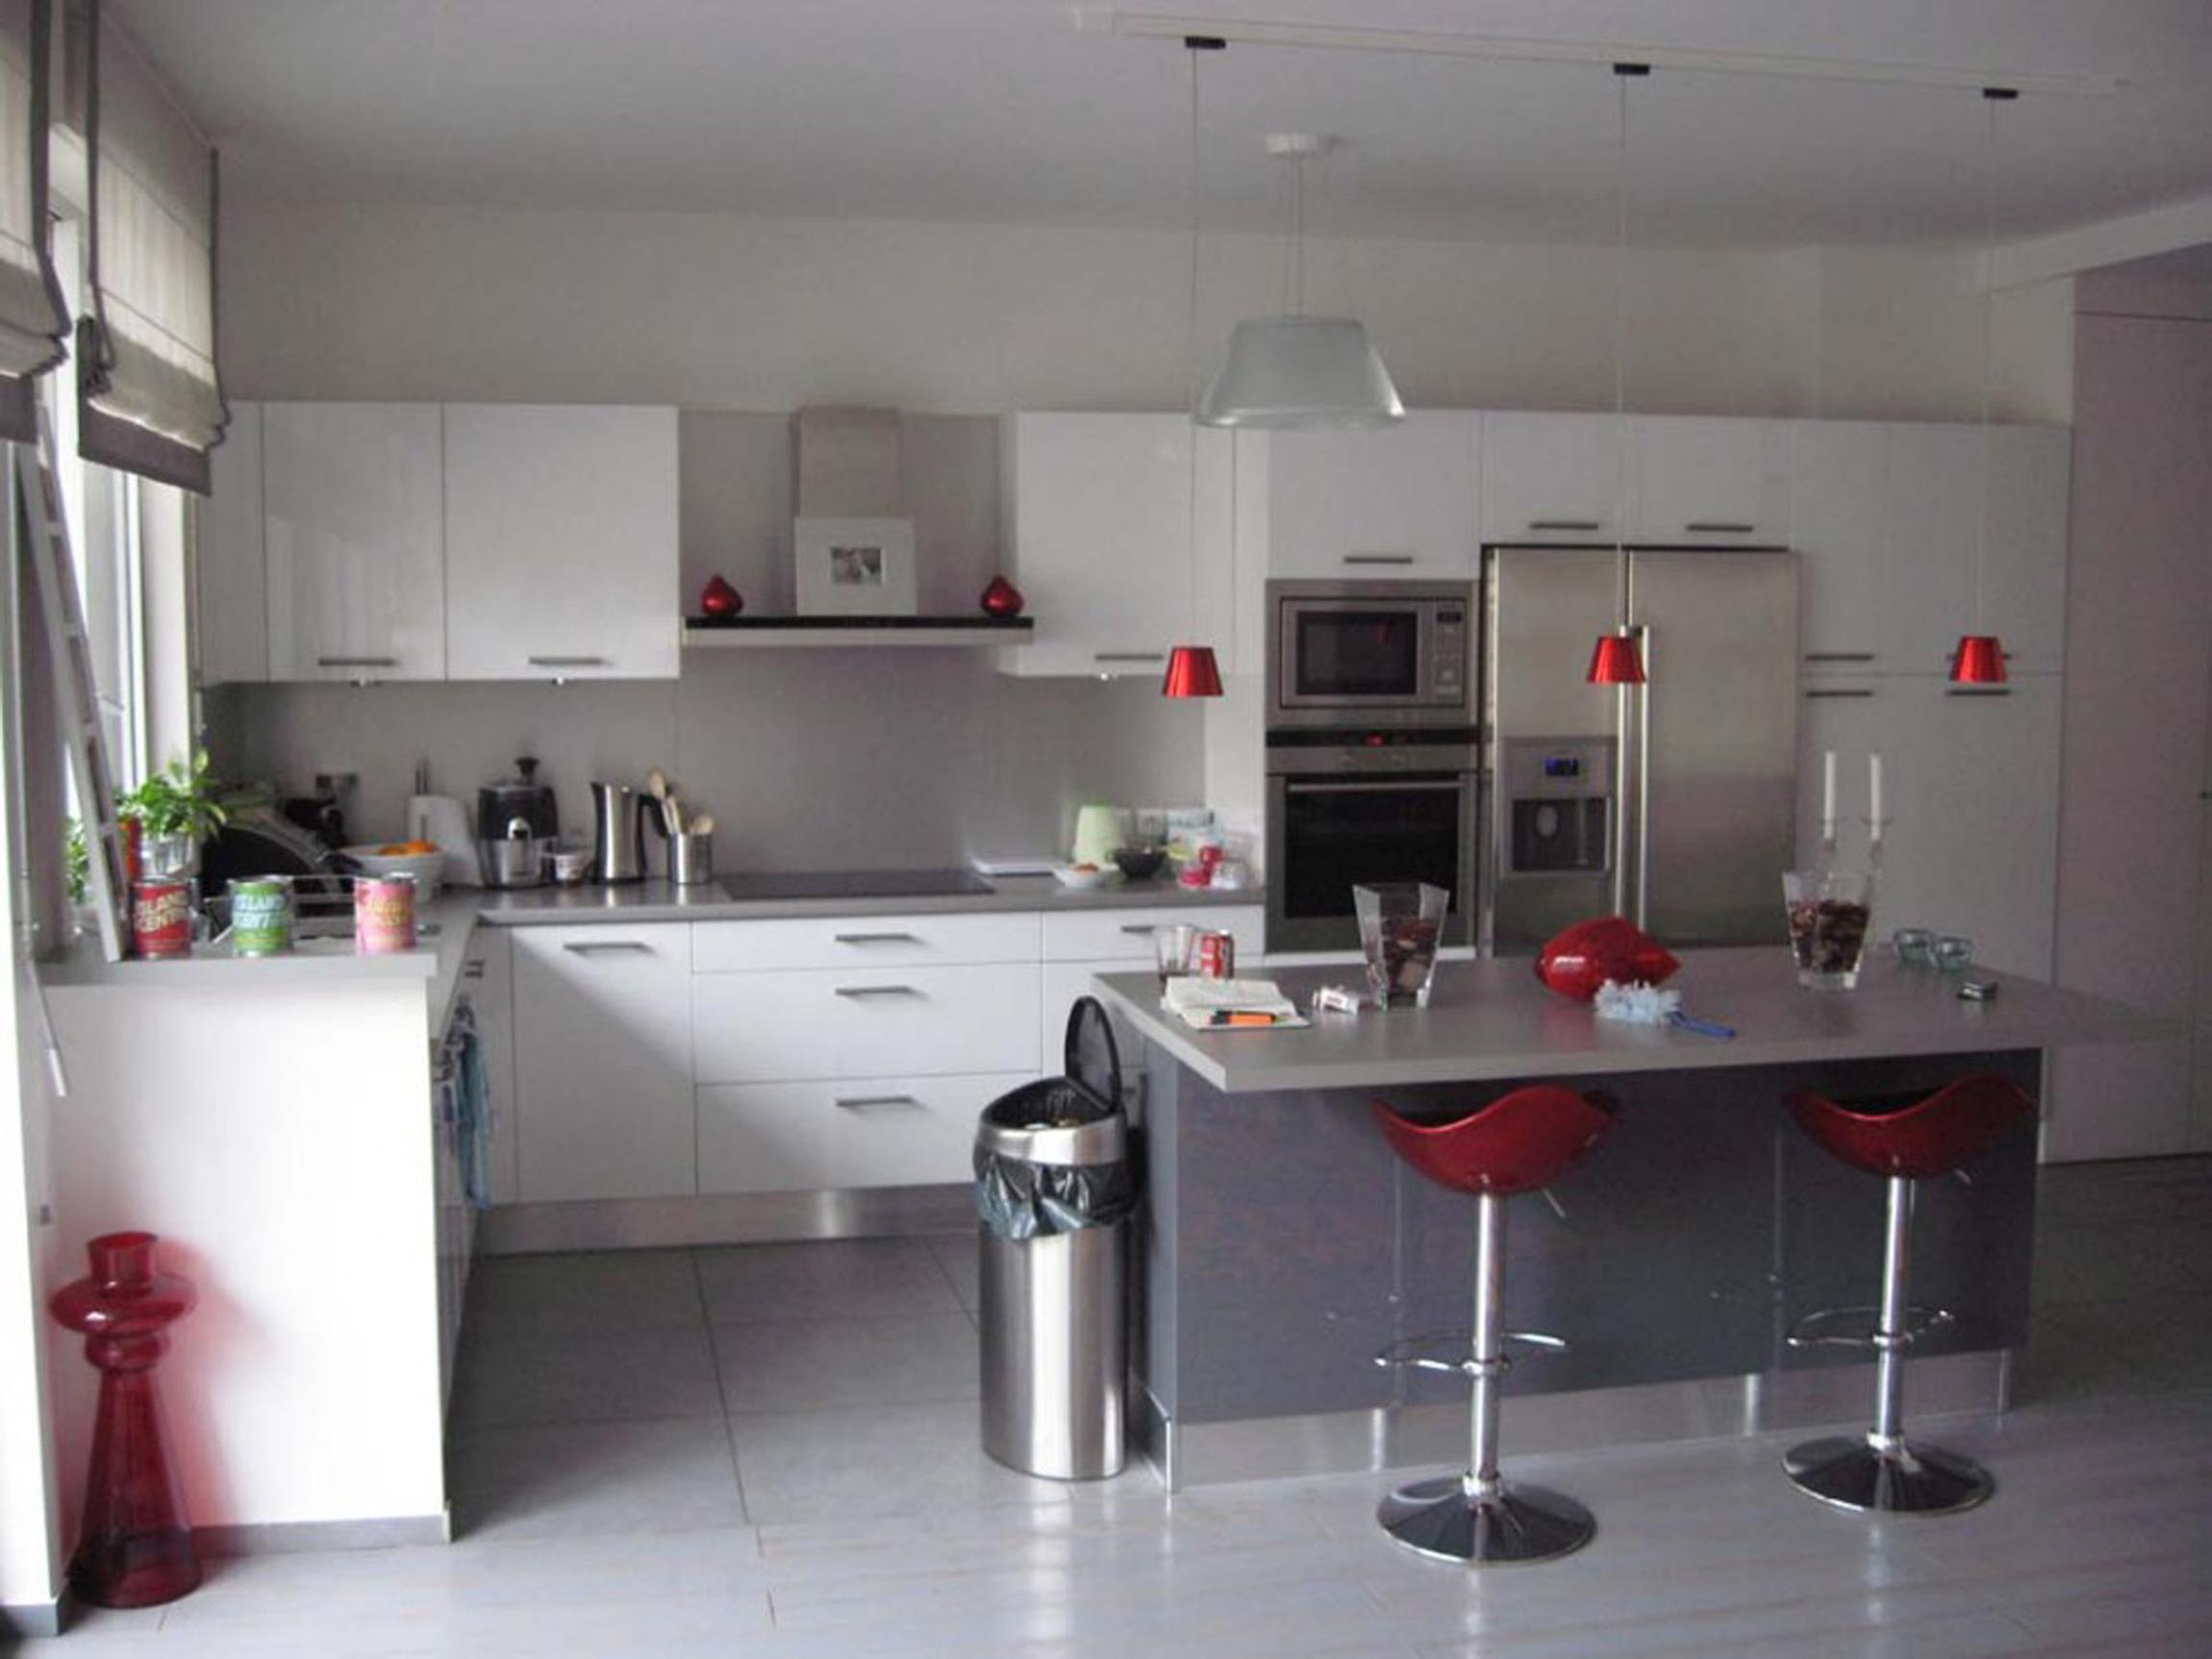 Kitchen Decoration White Grey Spacious France (View 24 of 31)